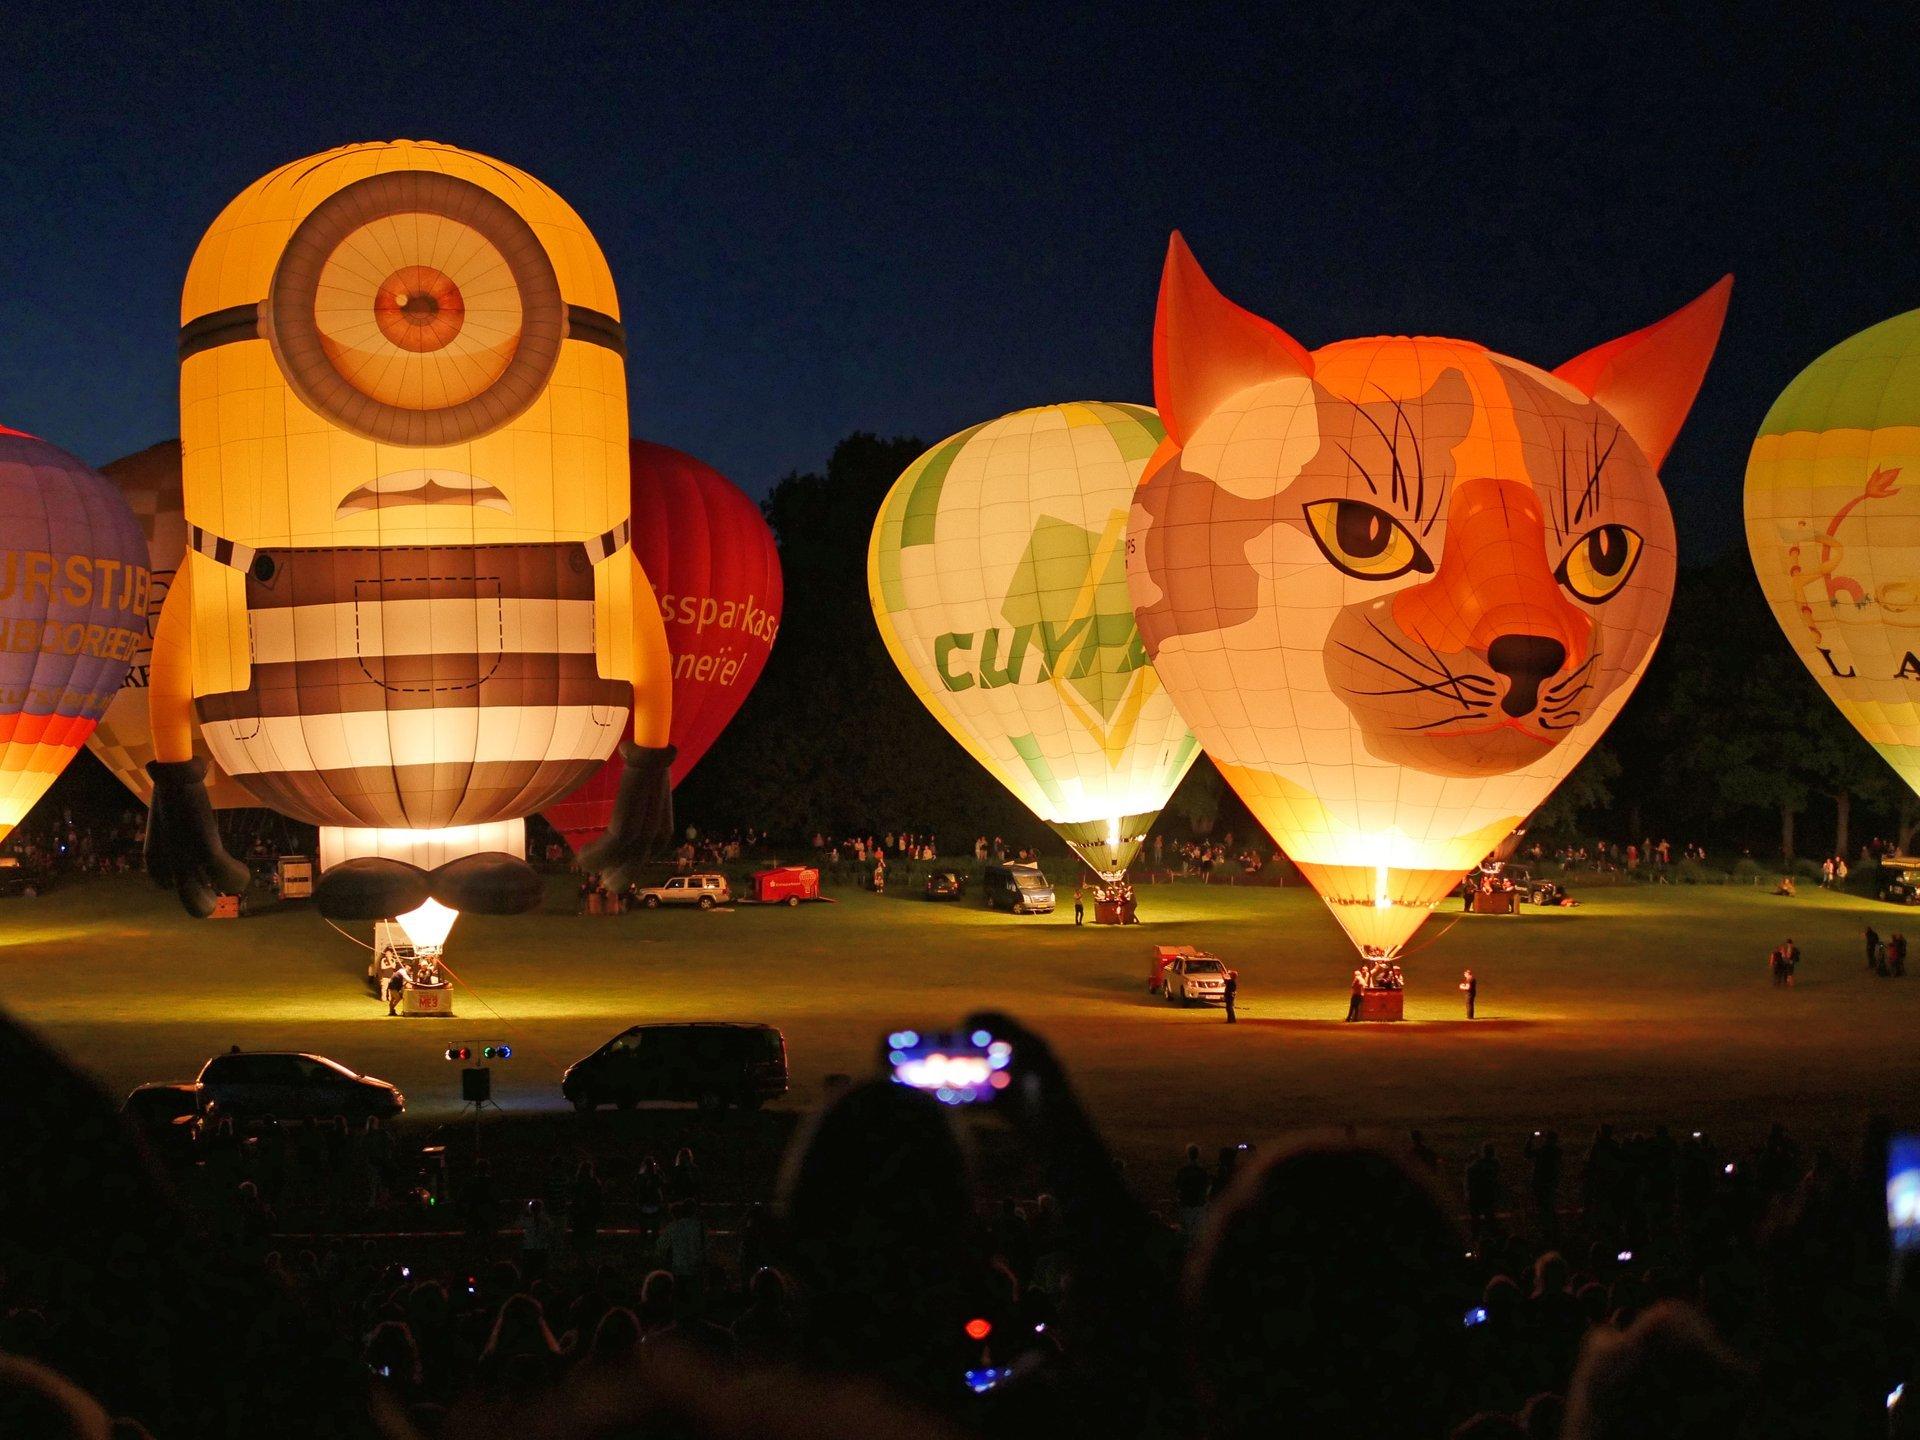 Best time for Ballonfestival Bonn in Germany 2020